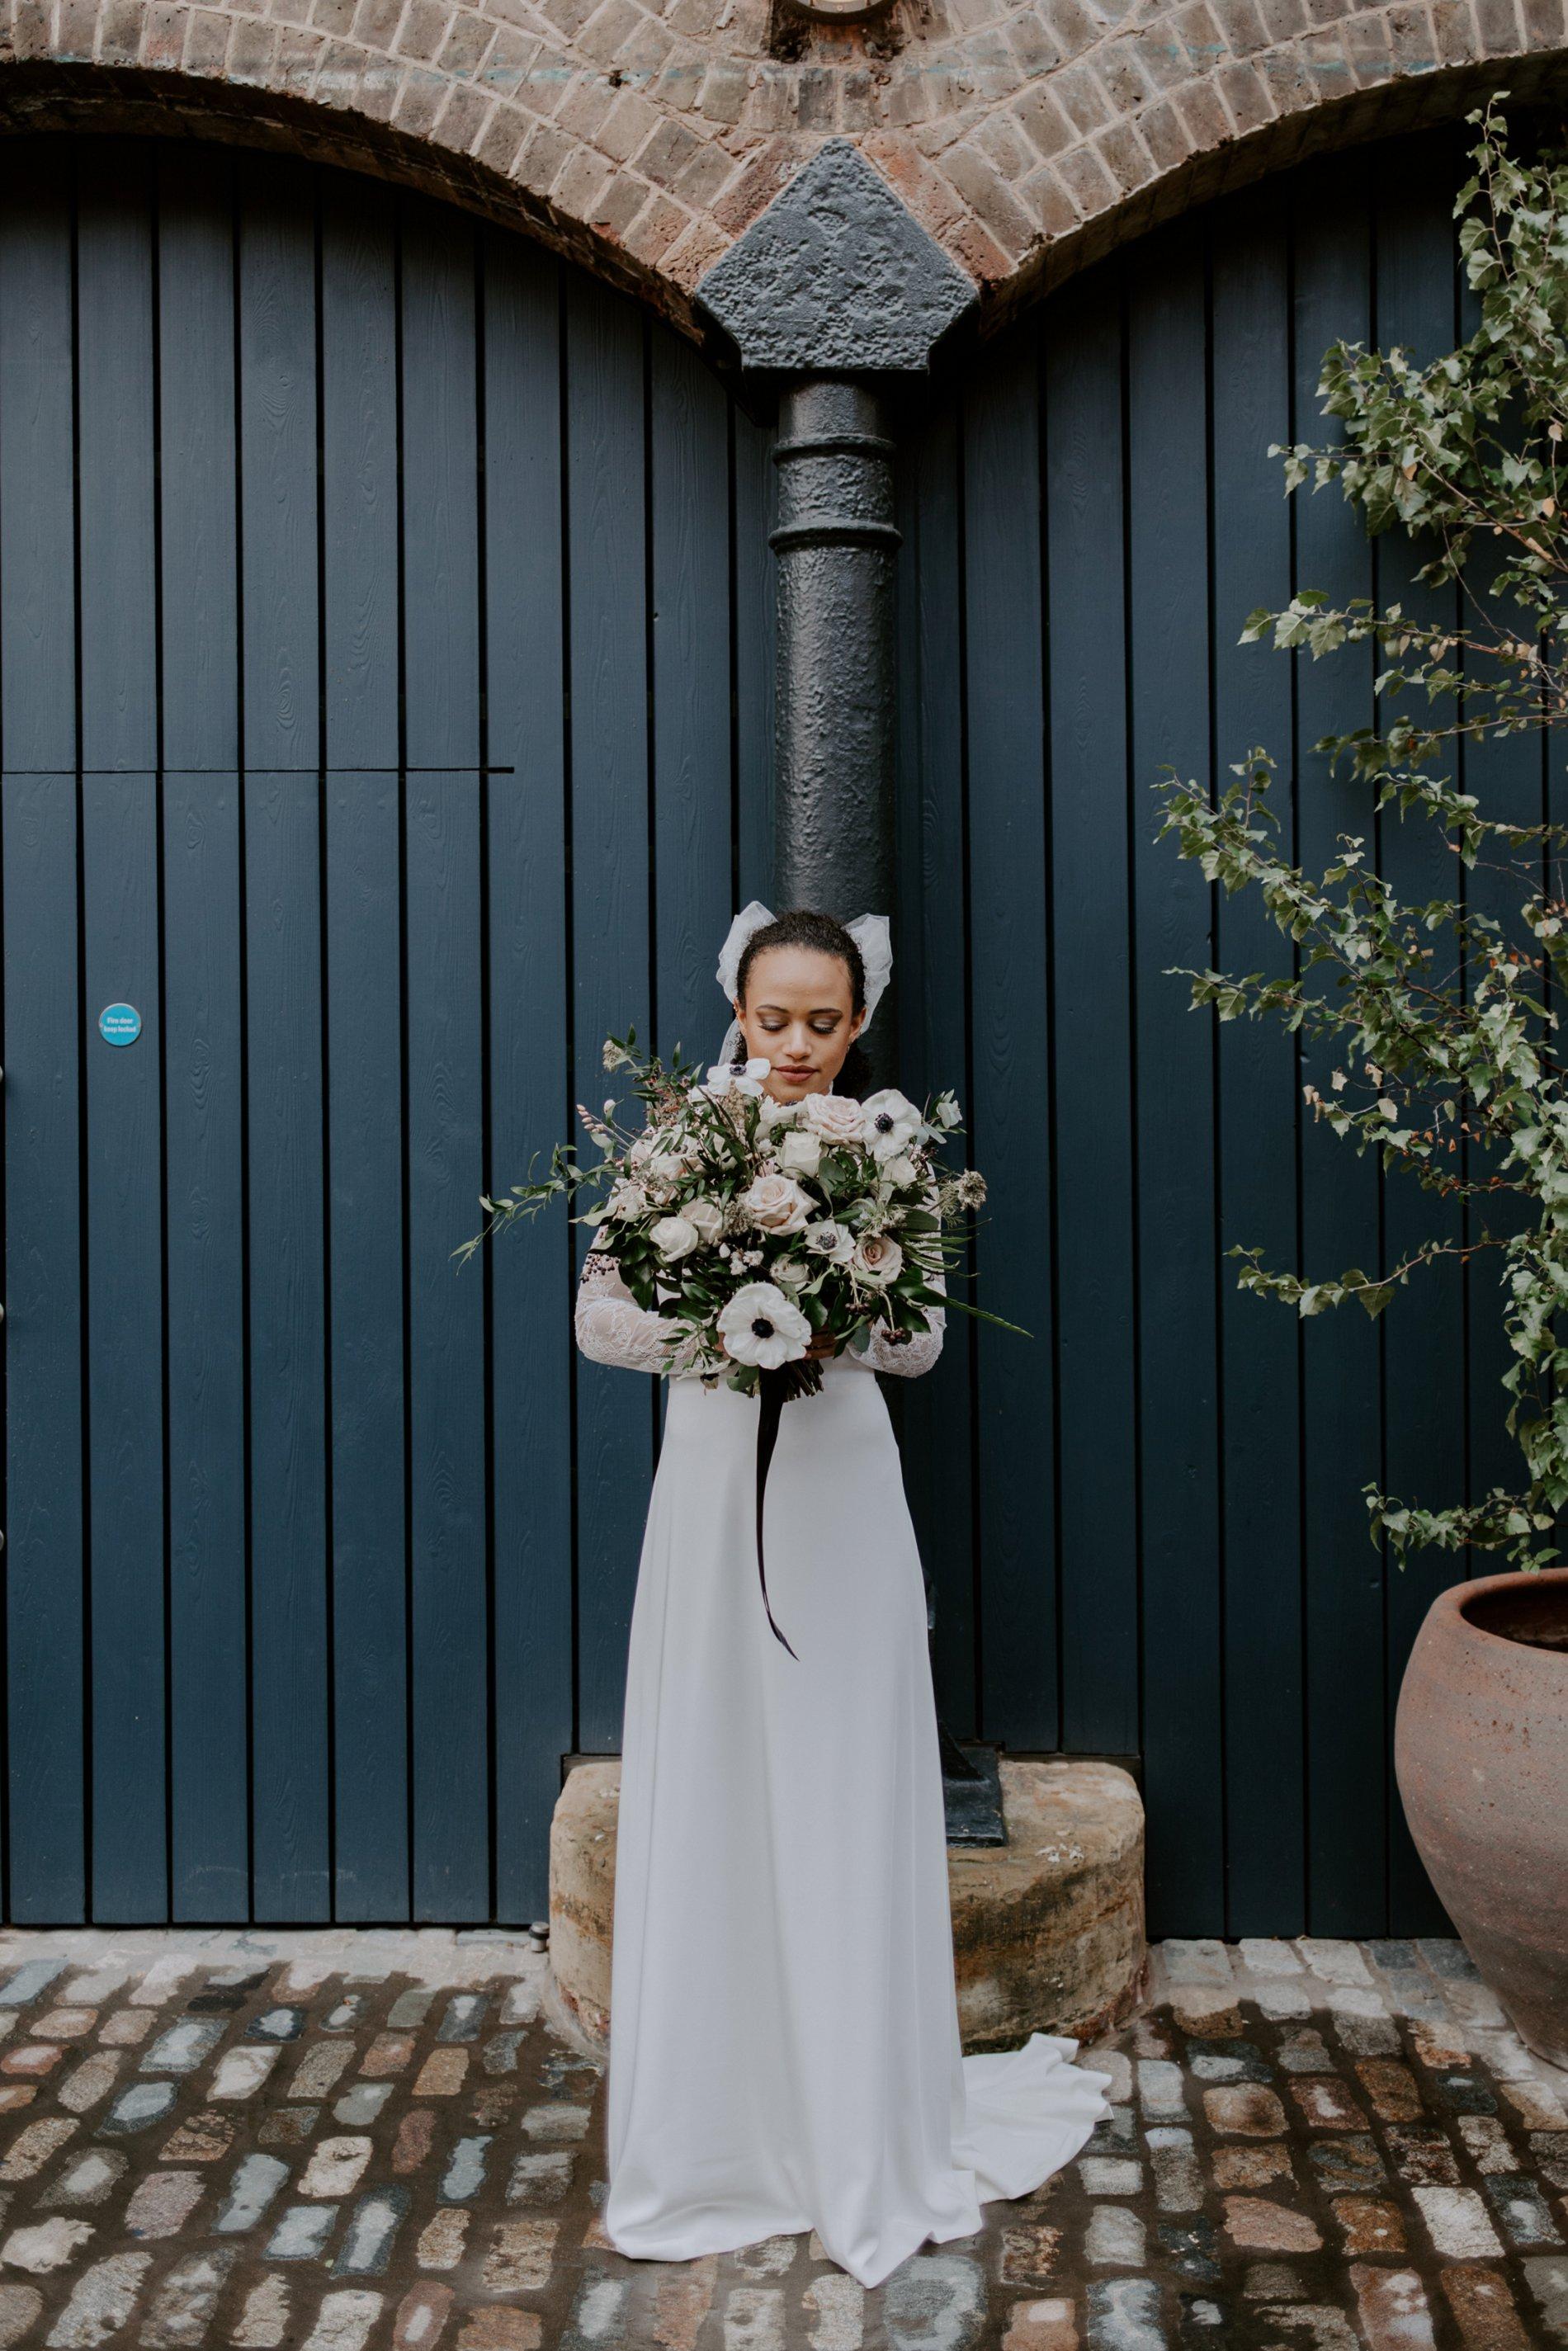 City Wedding Styled Shoot at Coal Drops Yard (c) Emztography (10)